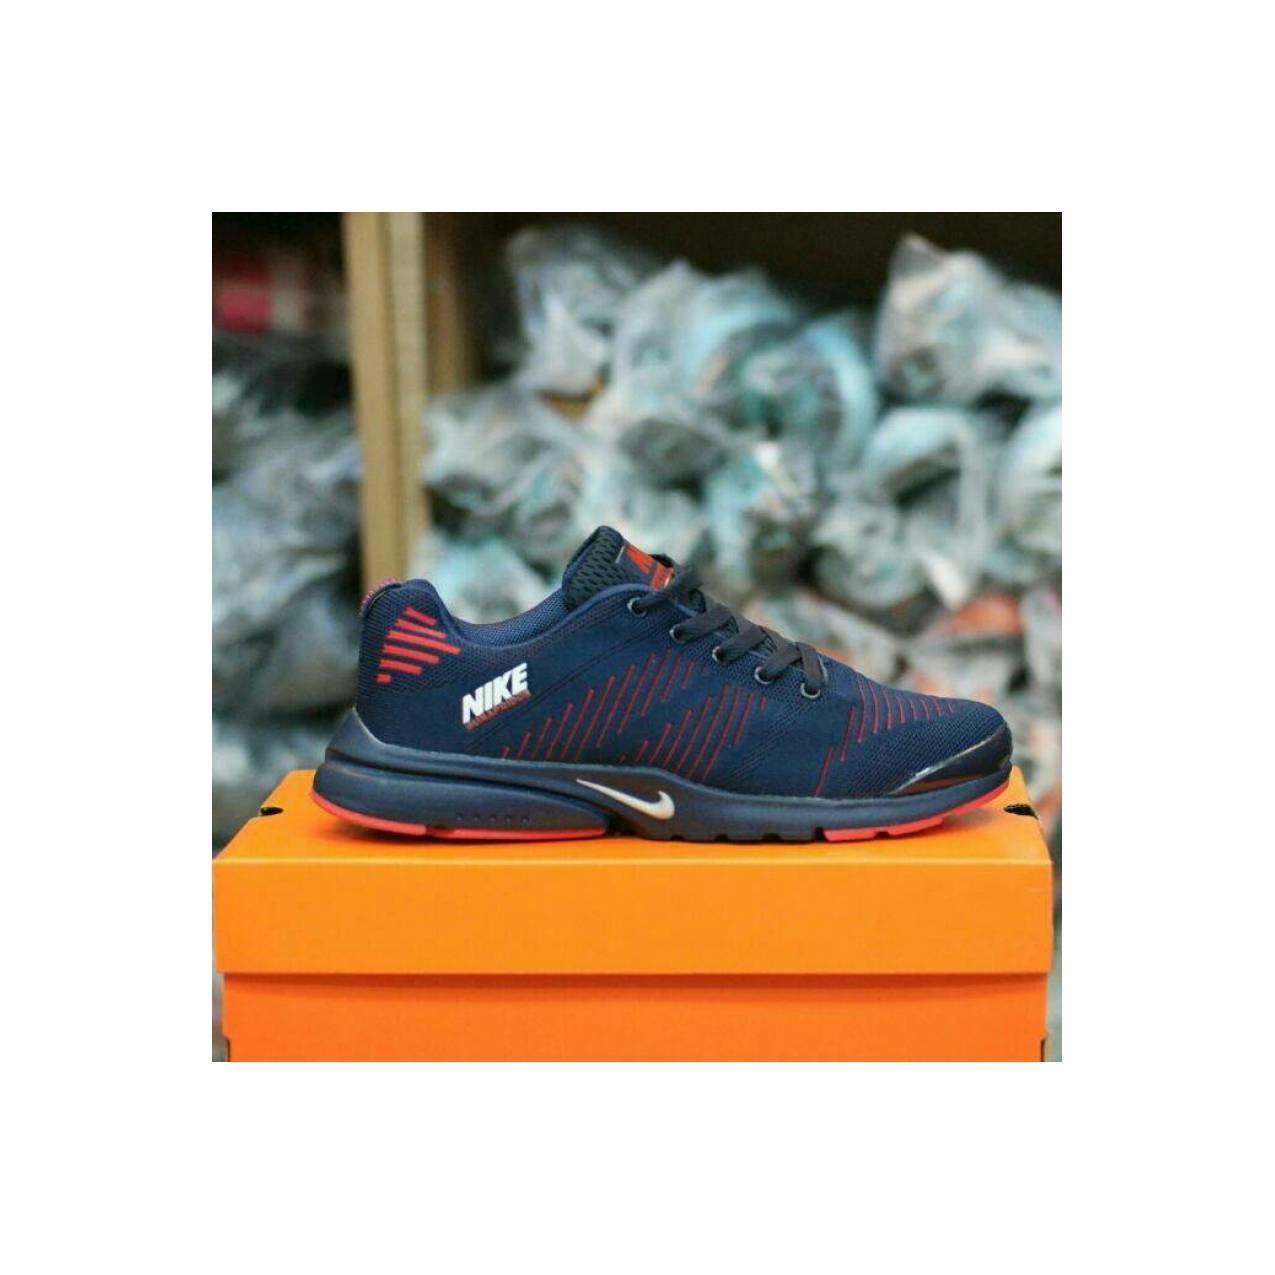 Sepatu terlaris Nike Air presto